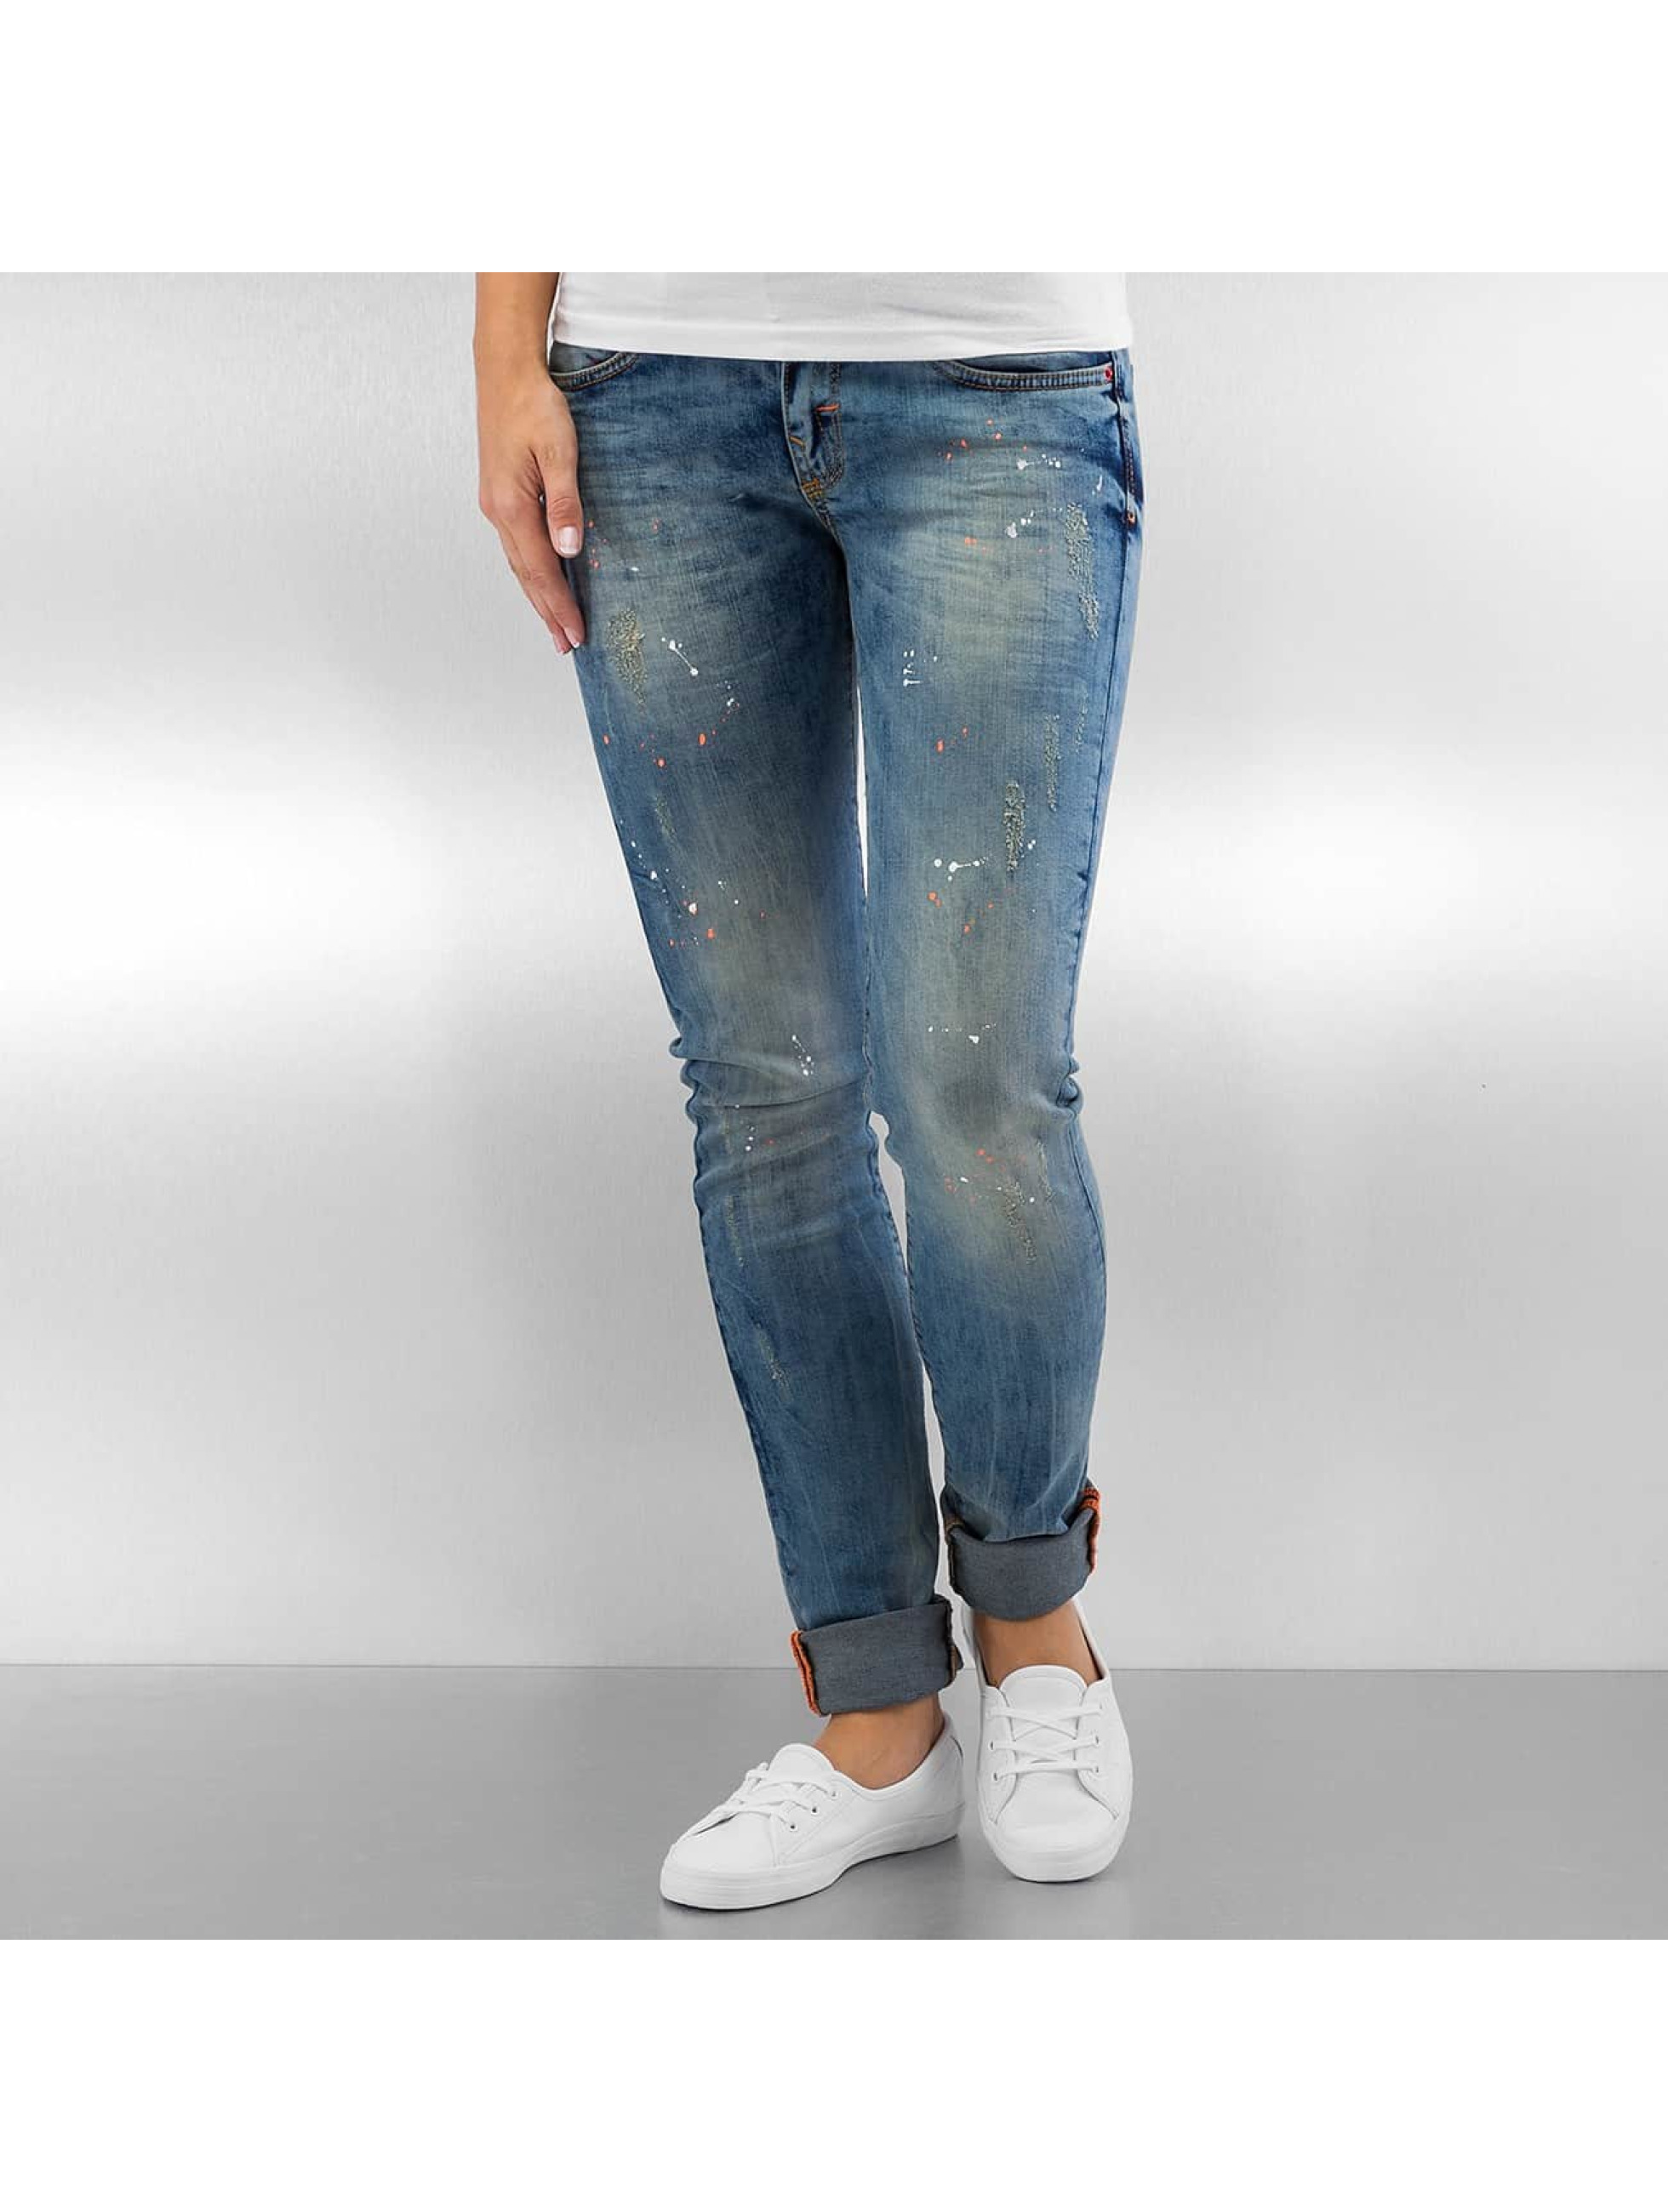 Pascucci Облегающие джинсы B-Leny синий